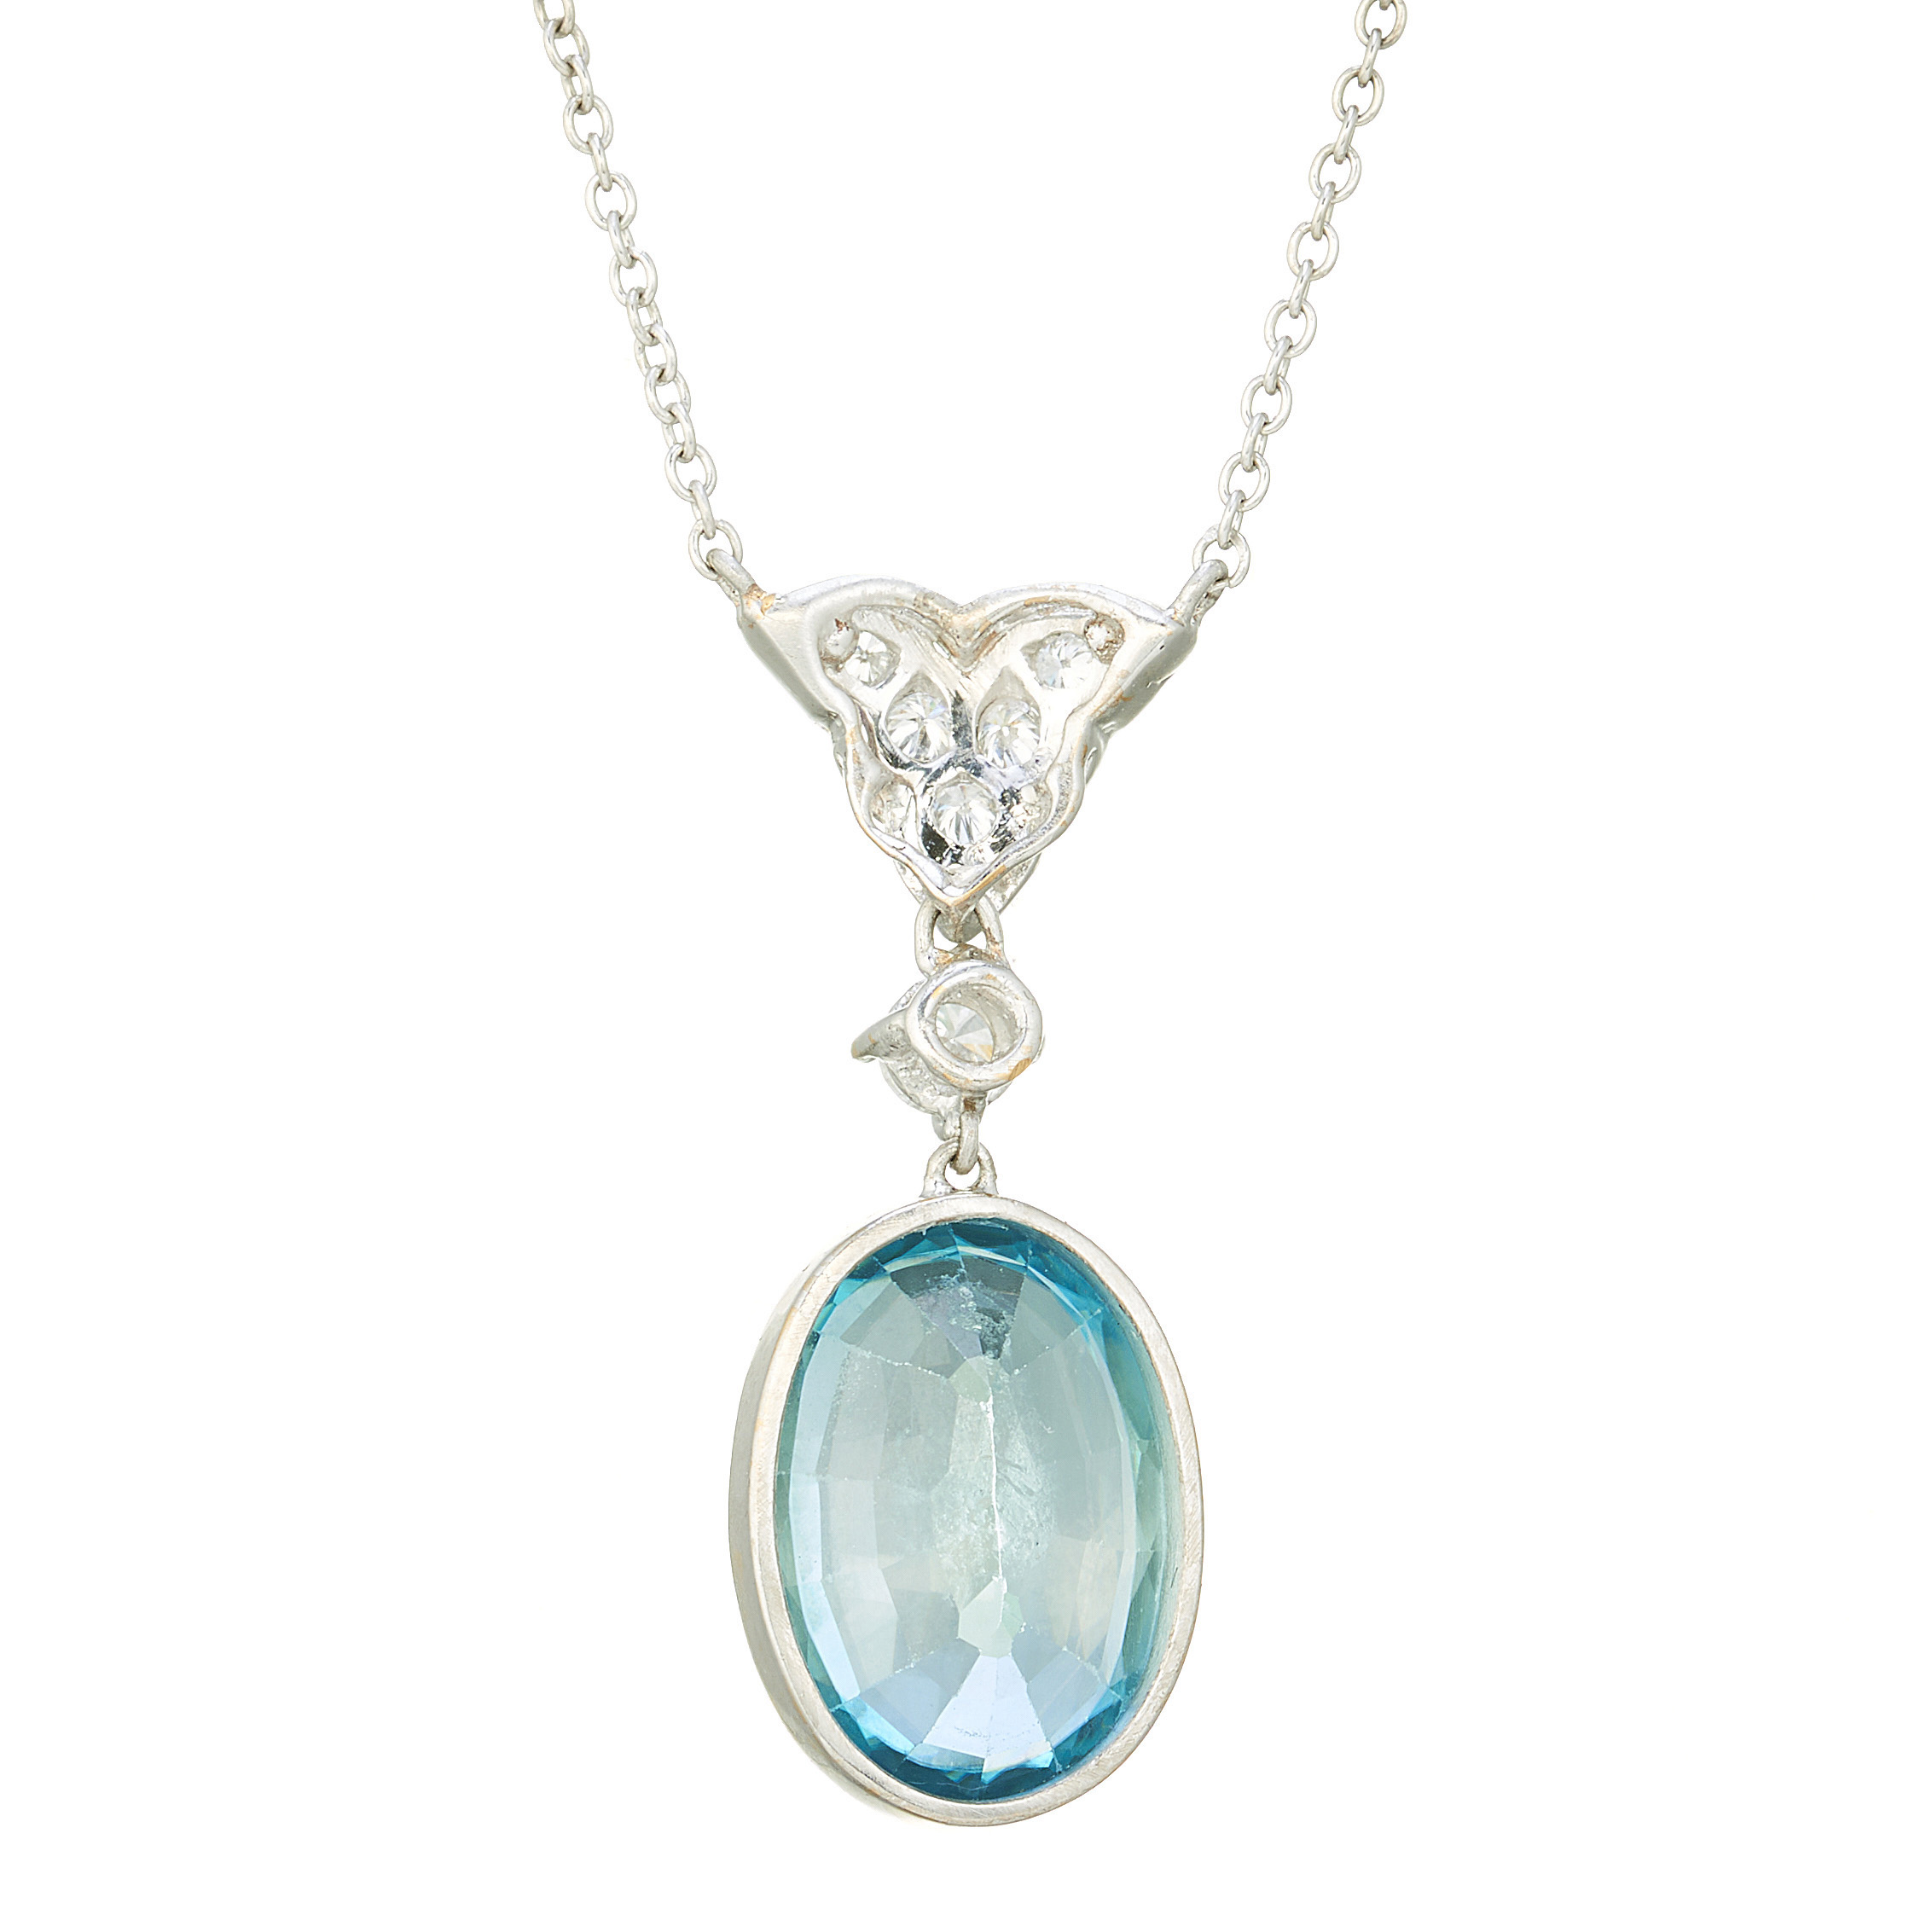 A platinum blue zircon and diamond necklace - Image 2 of 3